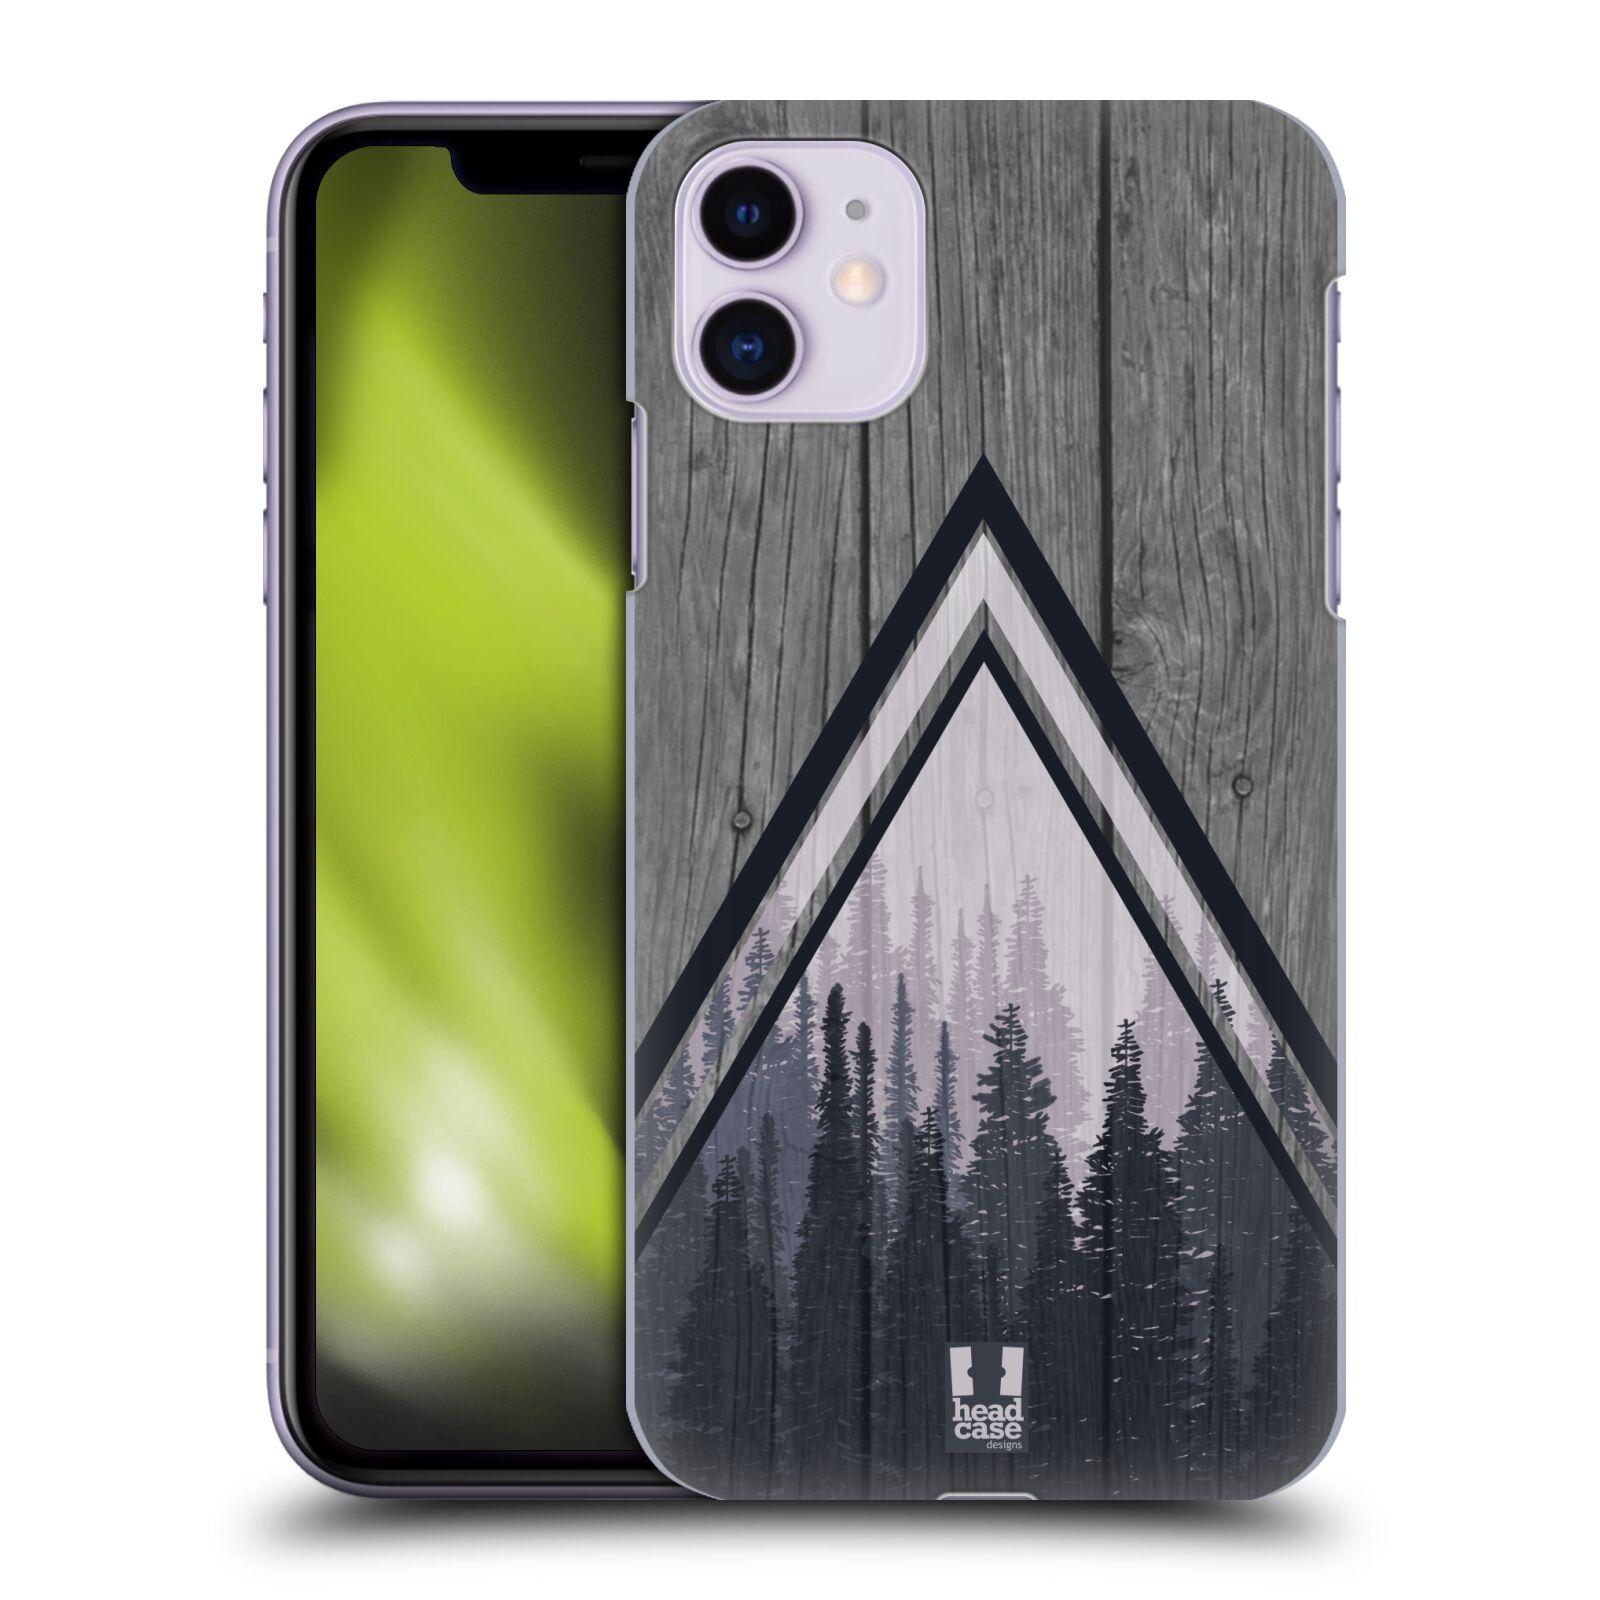 Plastové pouzdro na mobil Apple iPhone 11 - Head Case - Dřevo a temný les